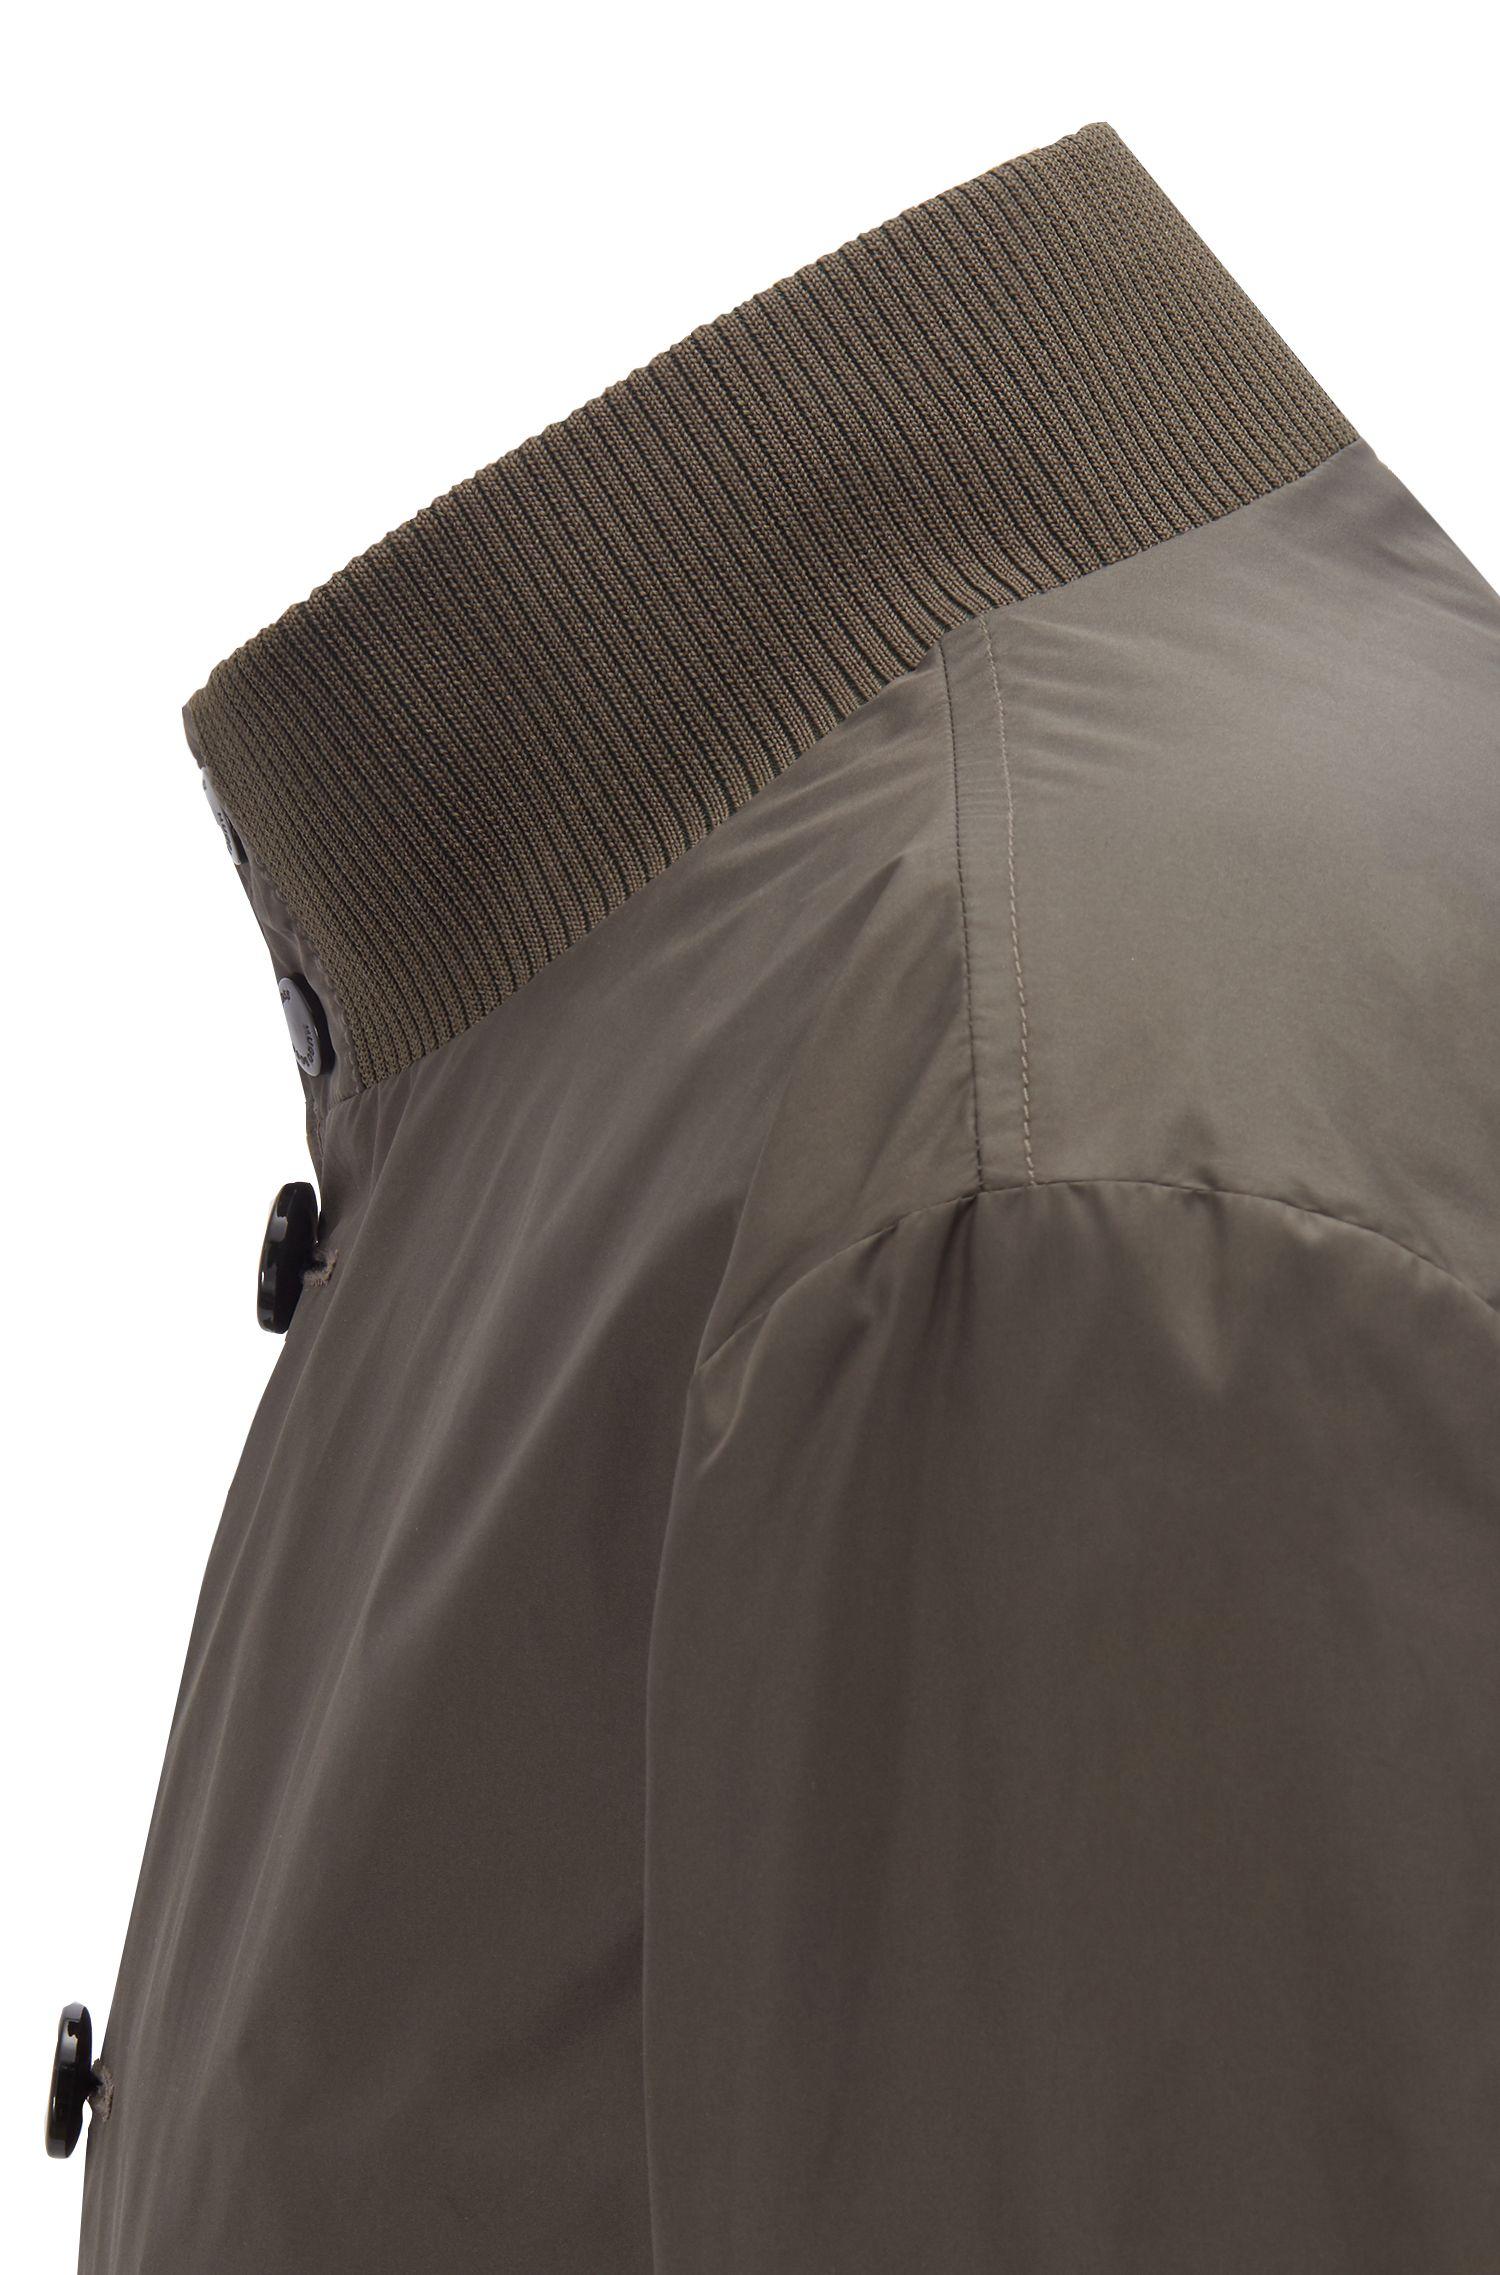 Opvouwbare blousonjas met knoopsluiting en gebreide details, Donkergroen